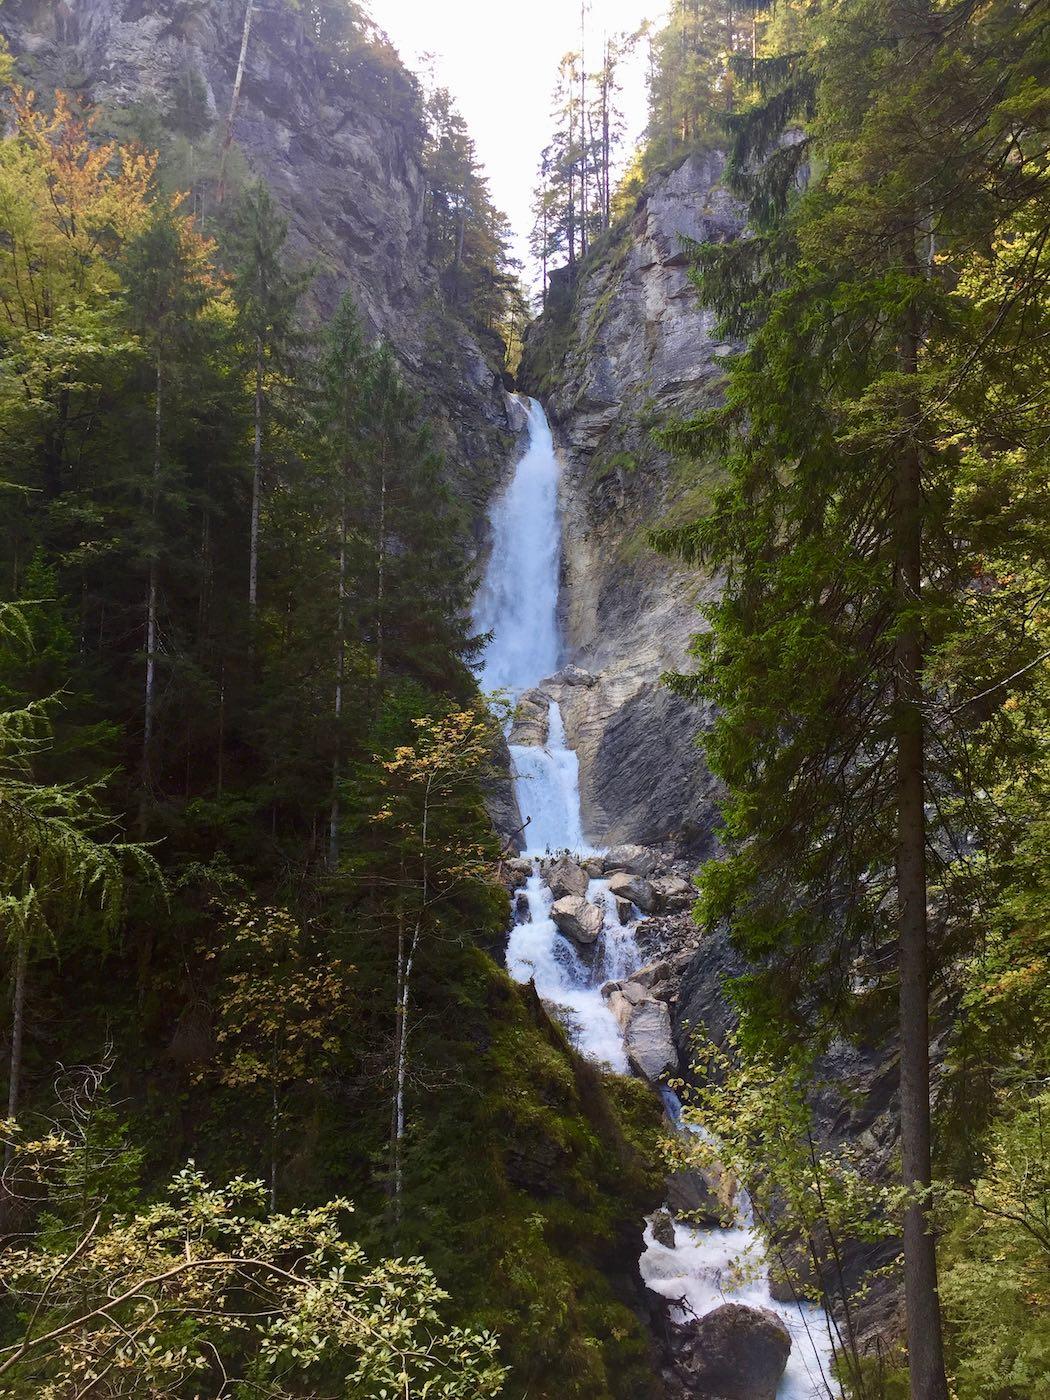 Outdoor Erlebnisse in Slowenien - cover